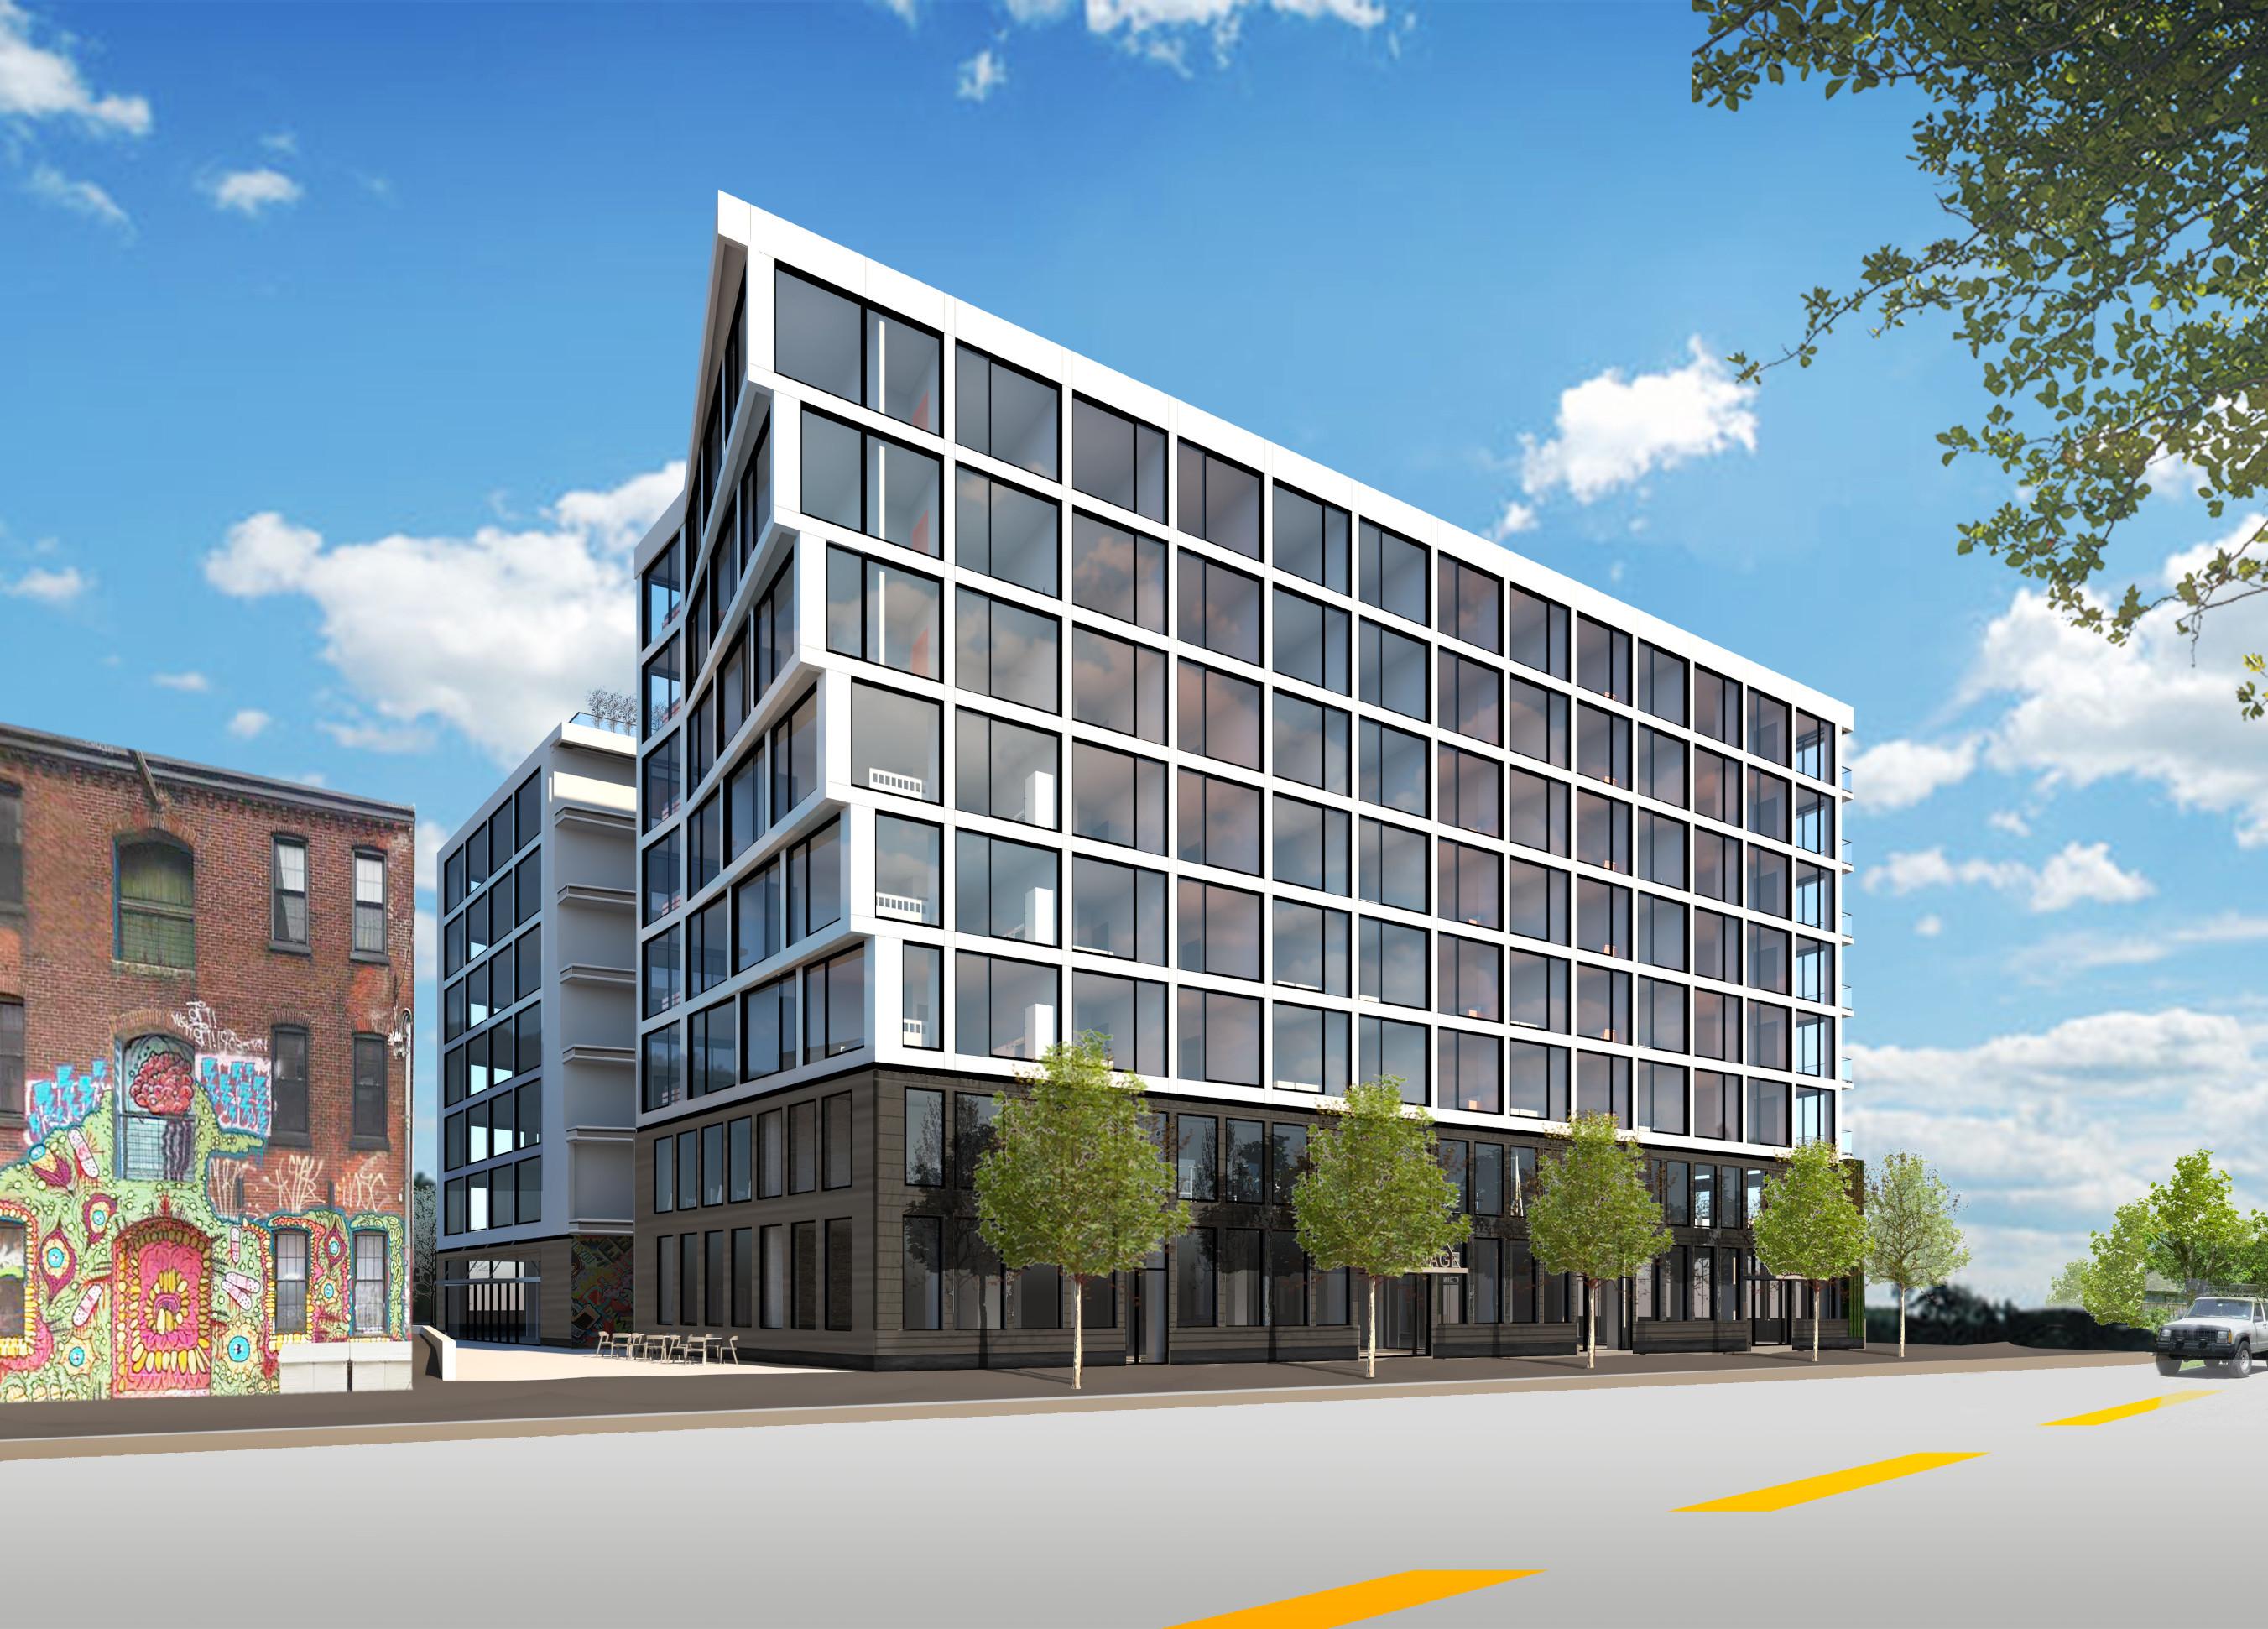 Tech Center Residential above Retail Cantilever Glass Philadelphia #livingcityarch